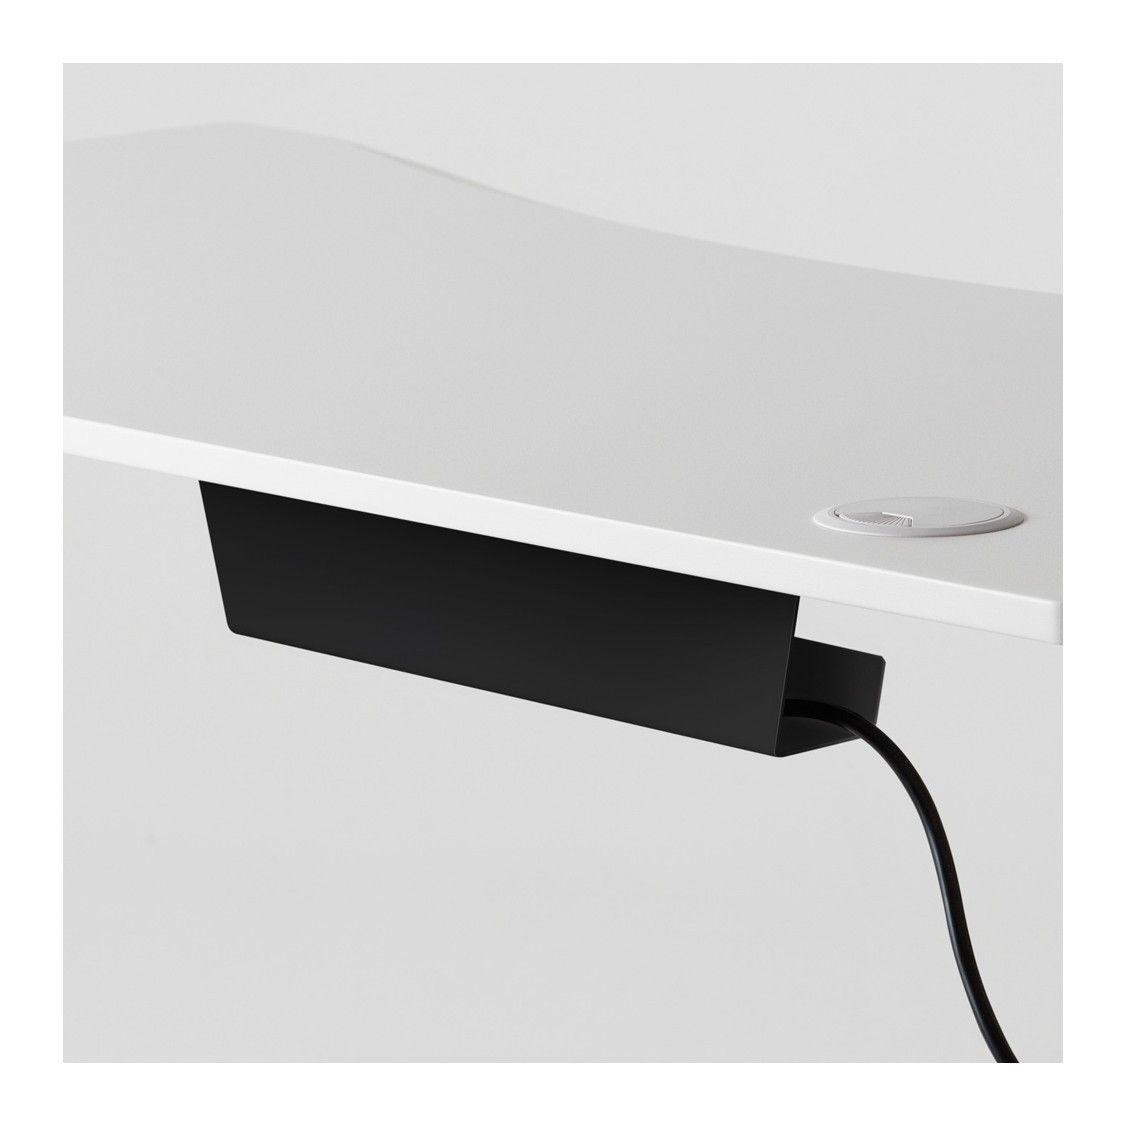 Wiretamer Cable Tray Adjustable Height Desk Desk